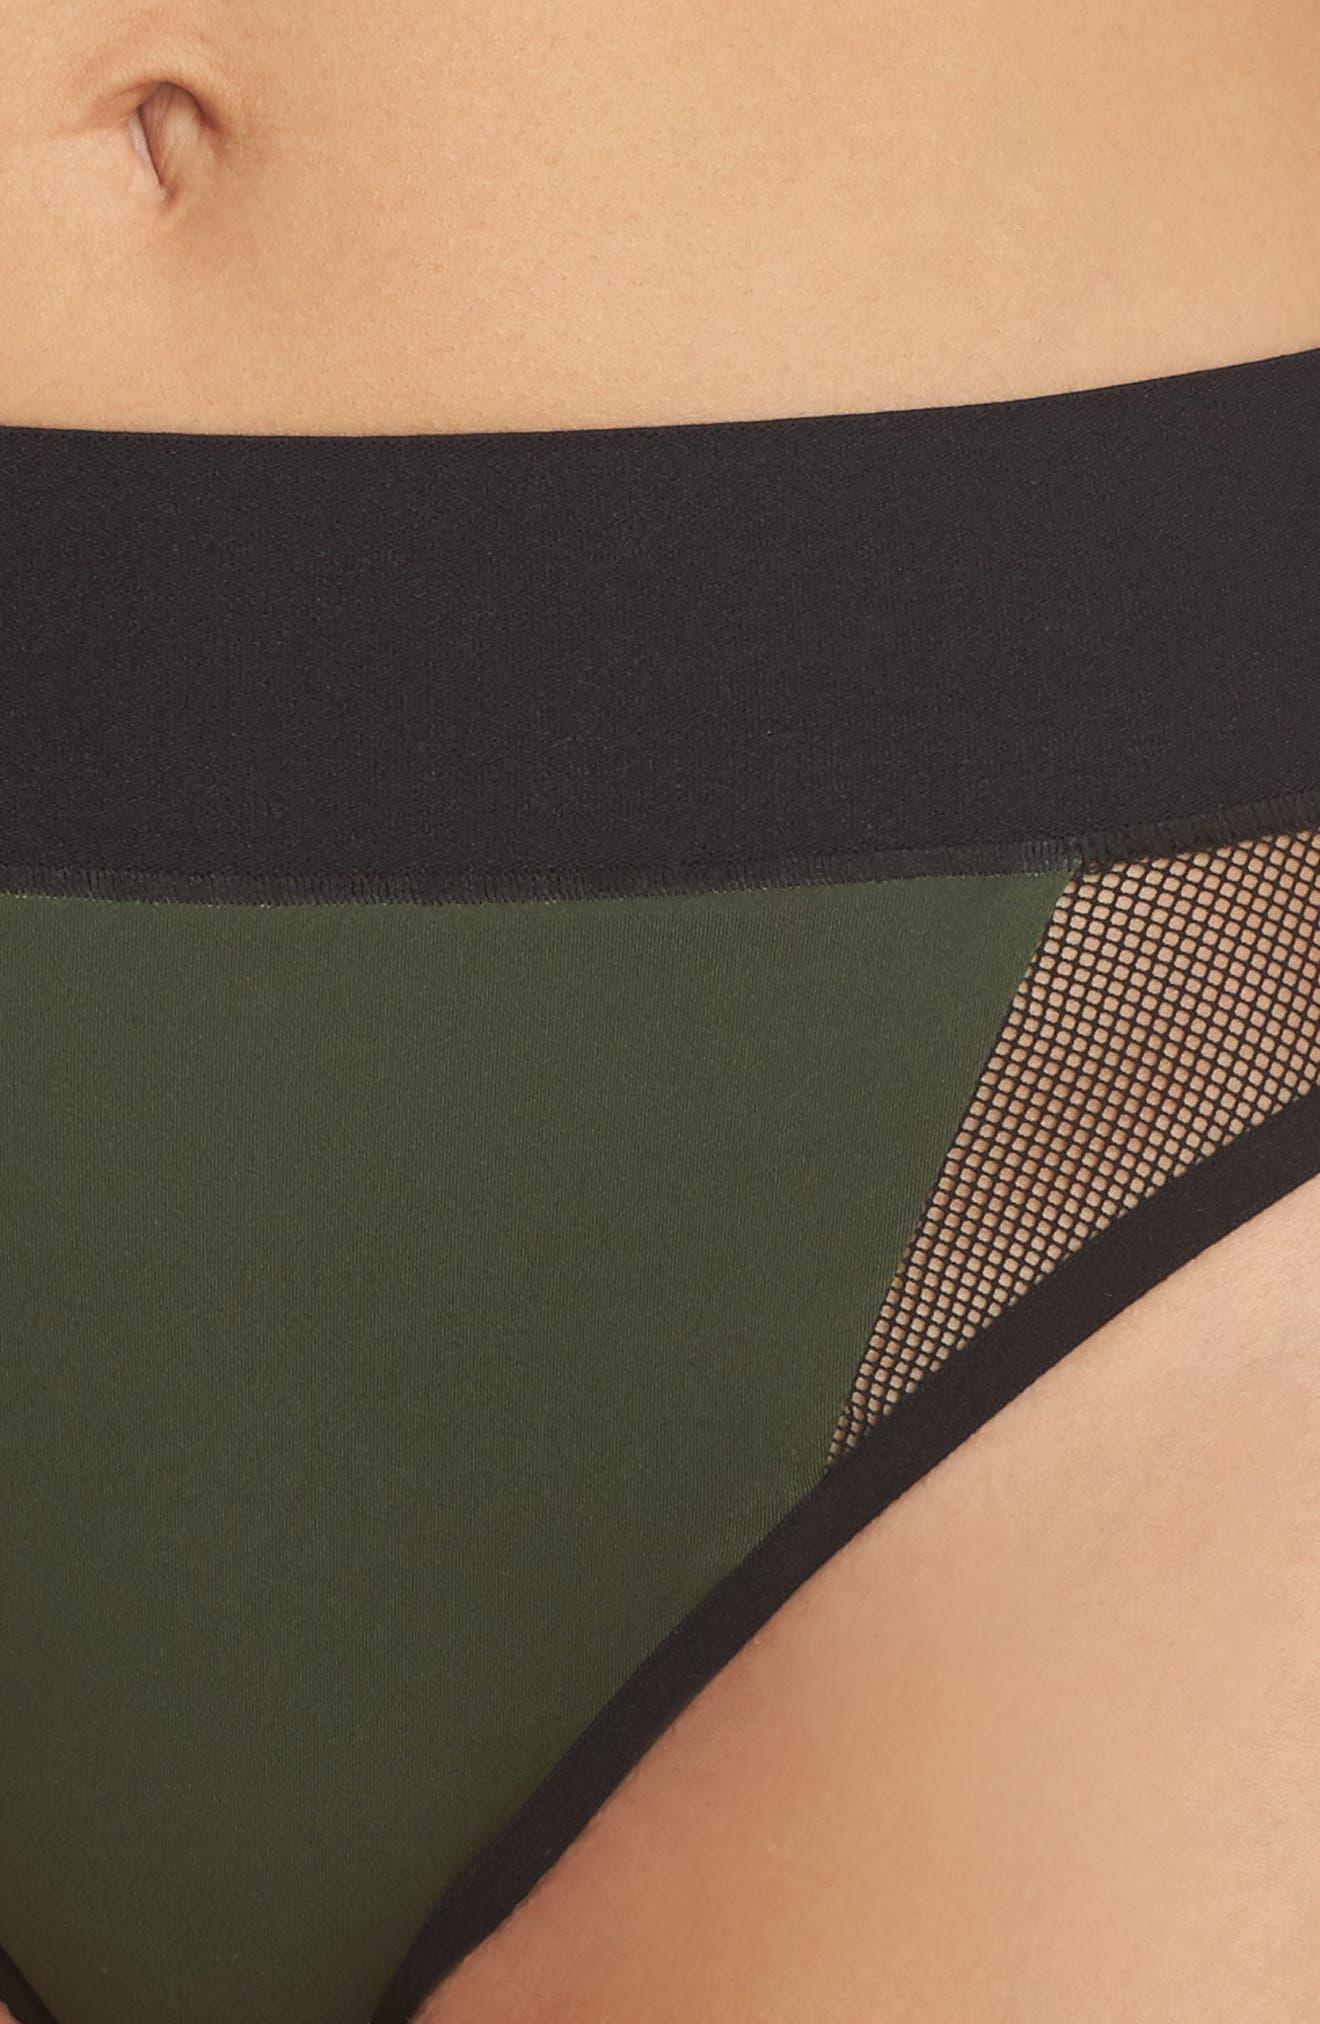 Reef Sport Mesh High-Waist Bikini Bottoms,                             Alternate thumbnail 4, color,                             302